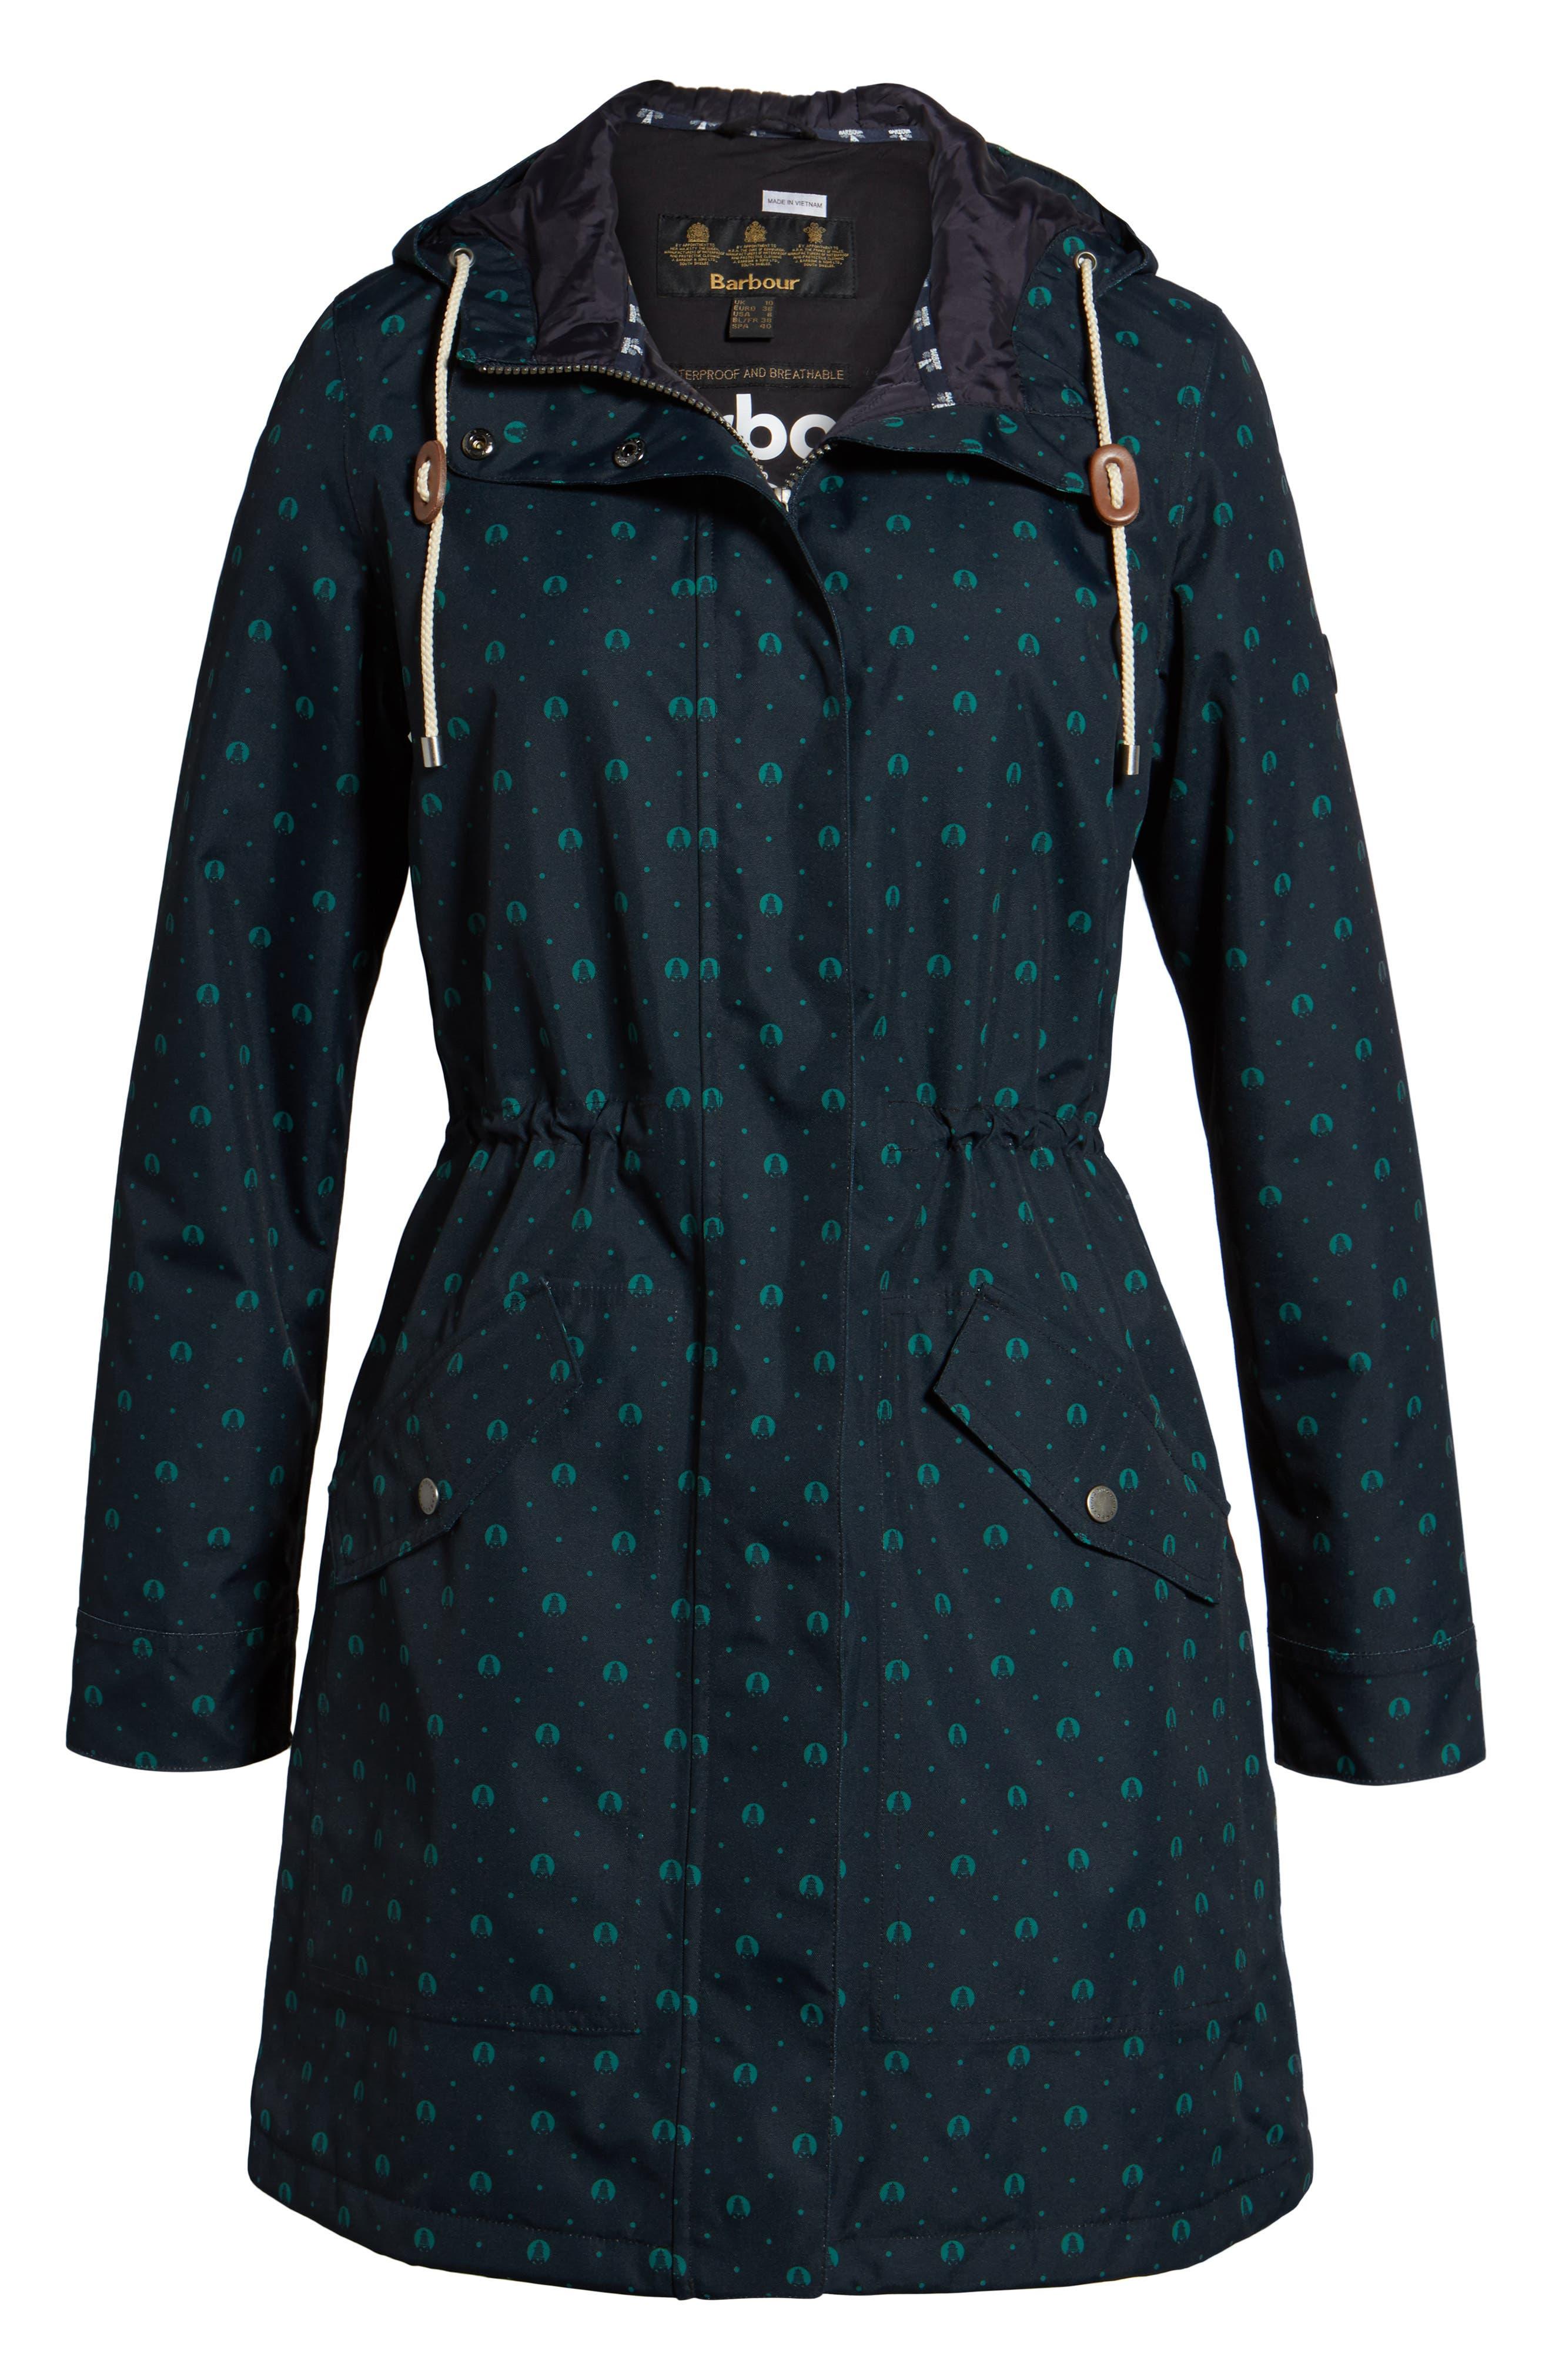 Decoy Anorak Jacket,                             Alternate thumbnail 6, color,                             Navy / Evergreen Beacon S